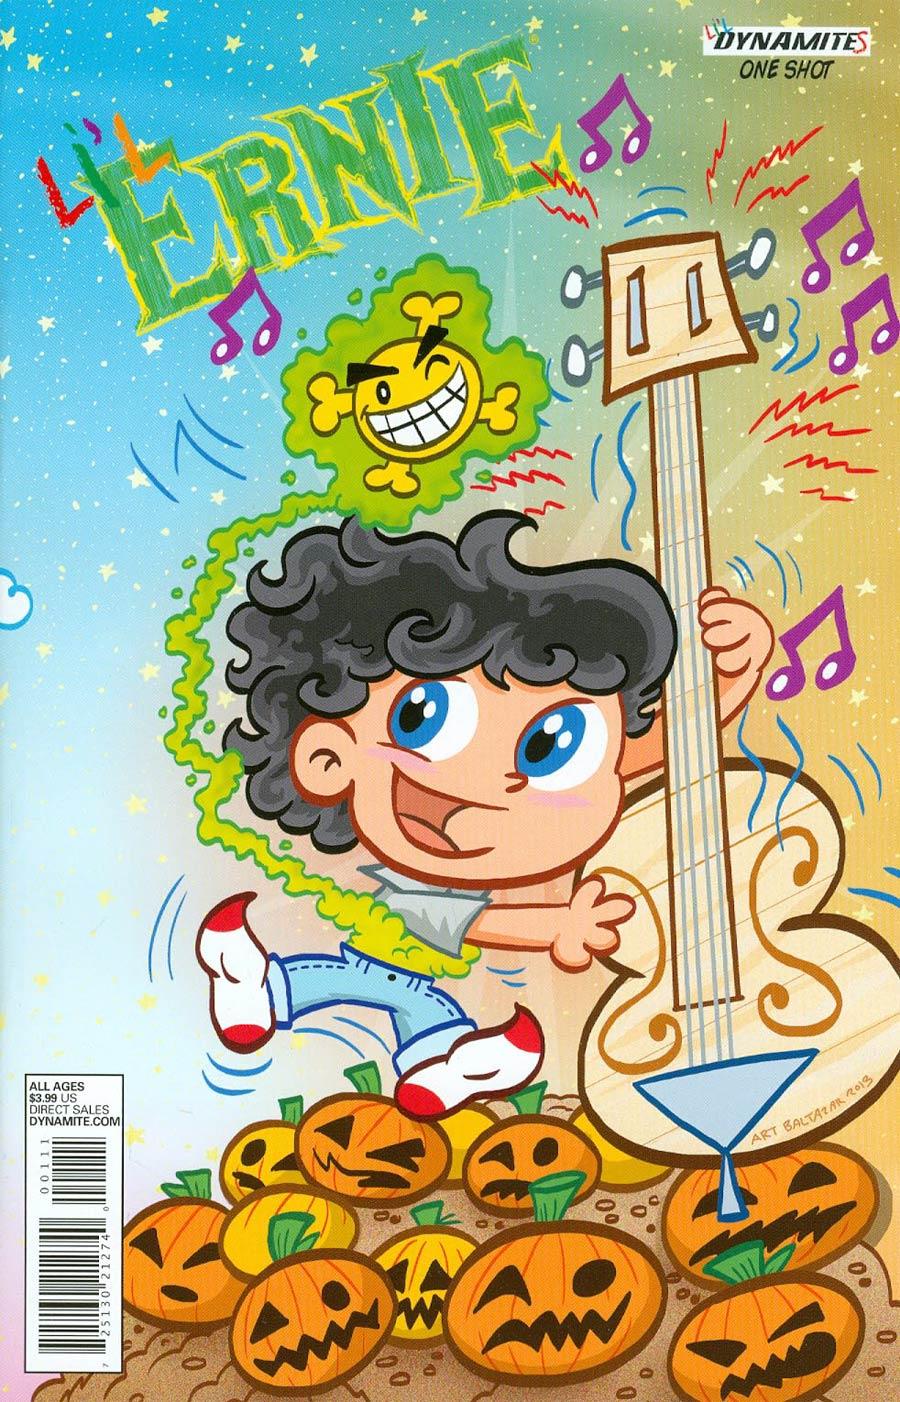 Lil Ernie #1 Cover A Regular Art Baltazar Cover